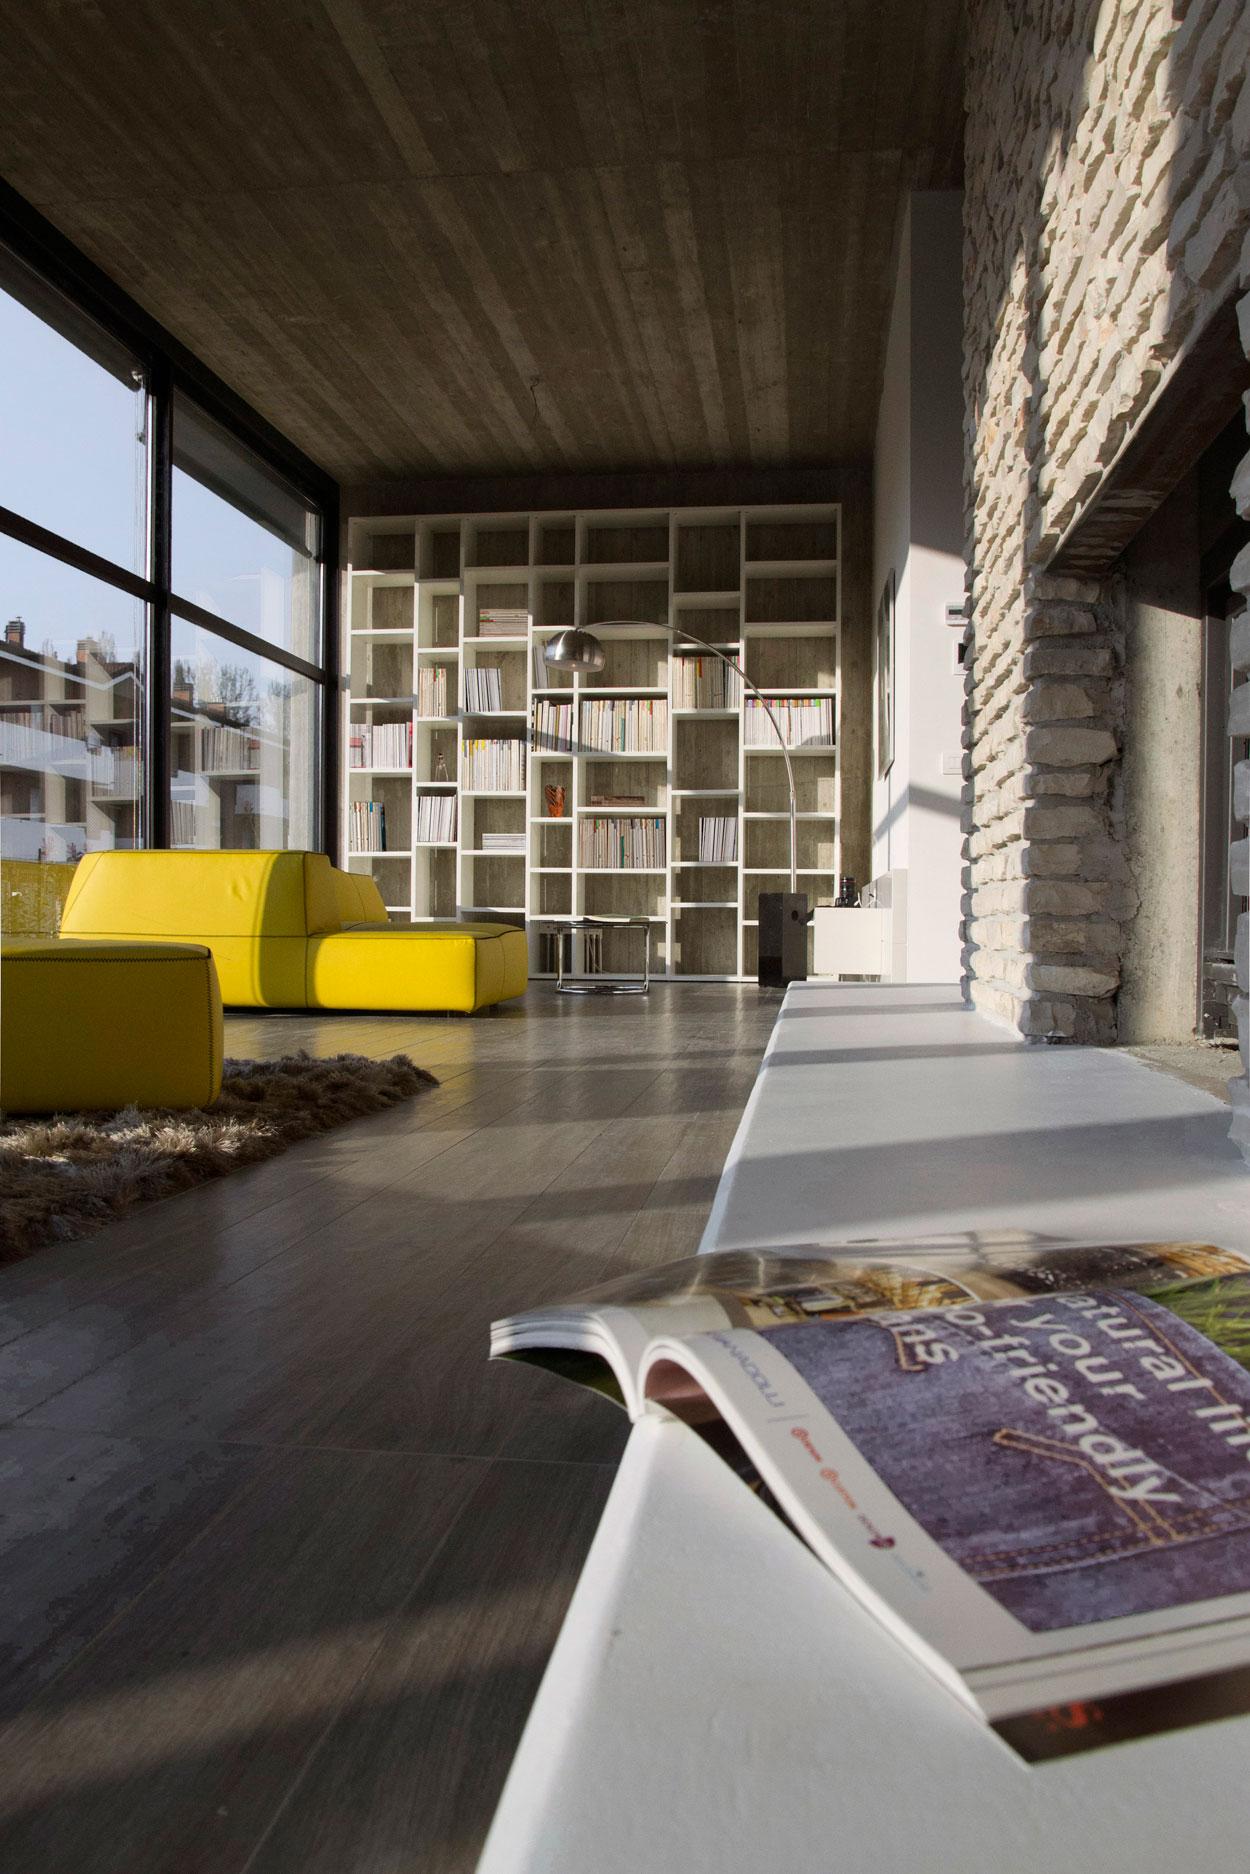 D'Autore Residence near Bologna by Giraldi Associati Architetti-15